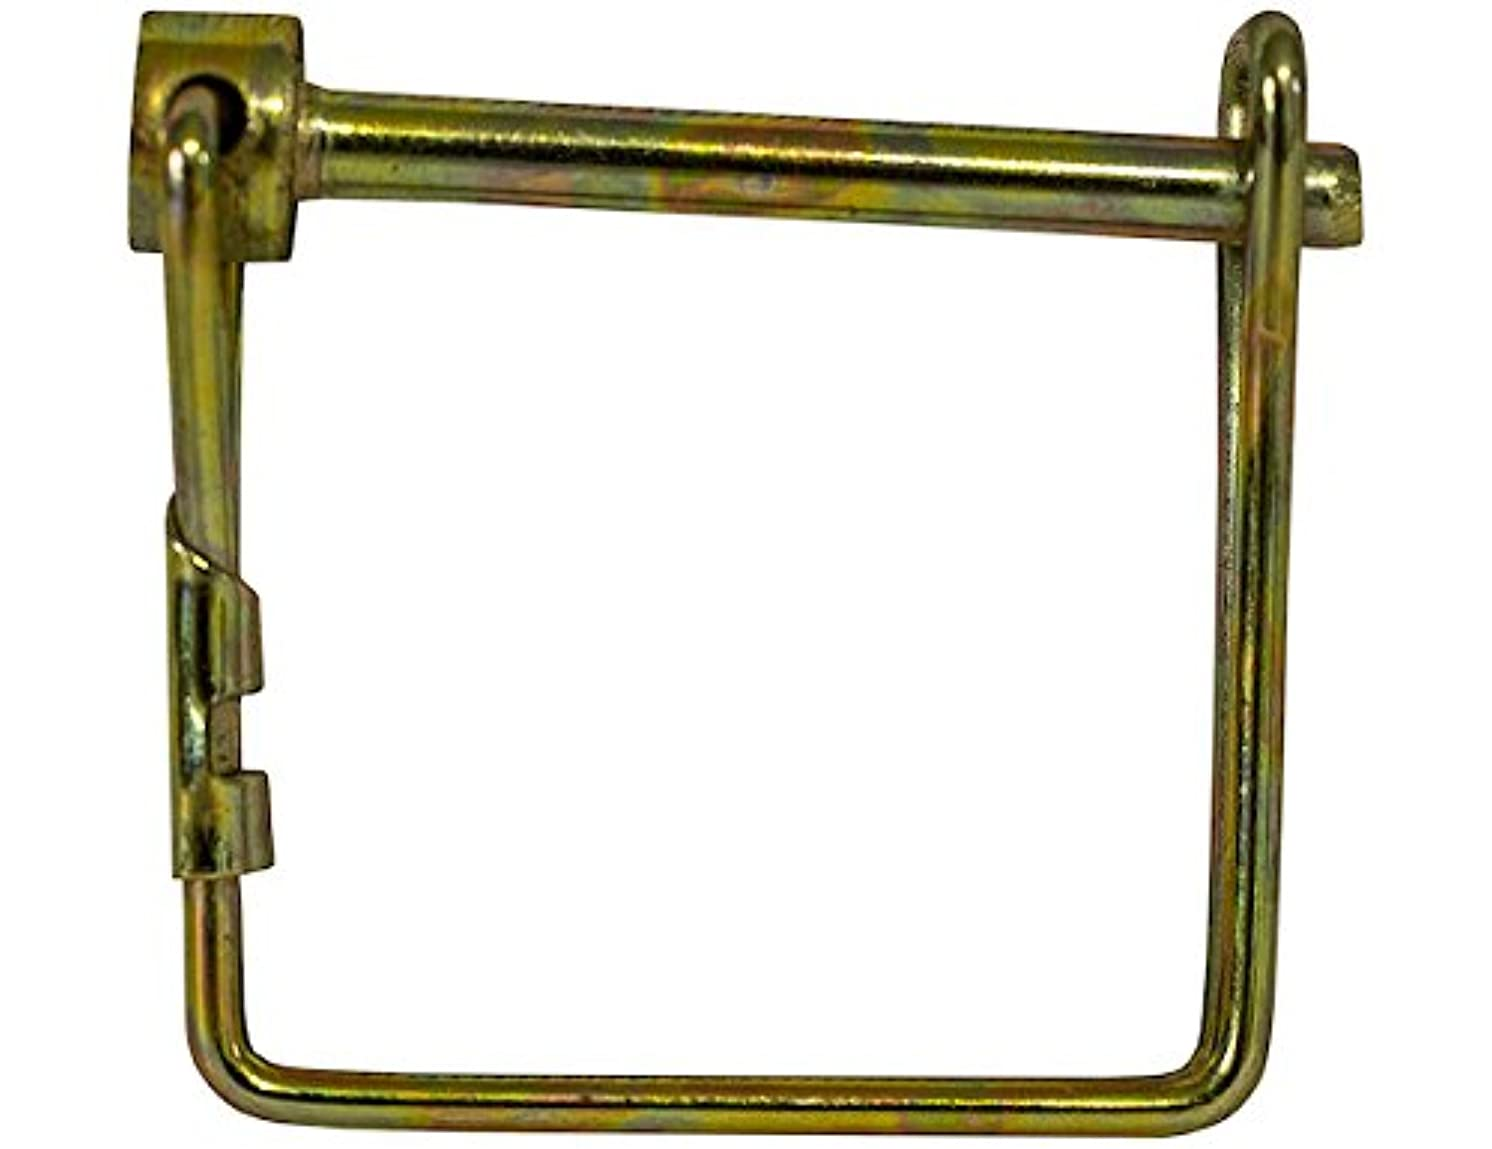 Buyers 66056 Wire Lock Pin 3/8